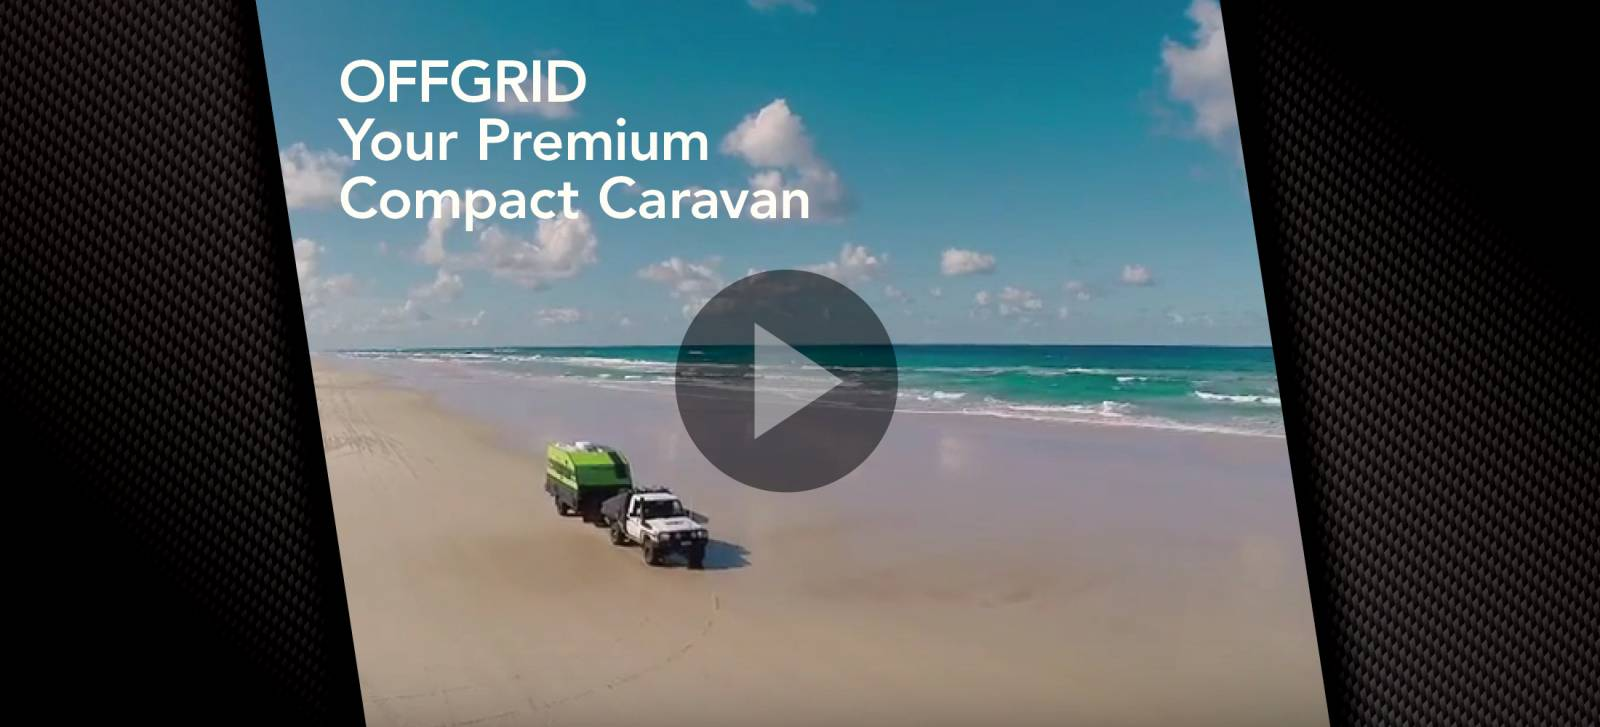 WUDU Lotus Caravans OffGrid Review